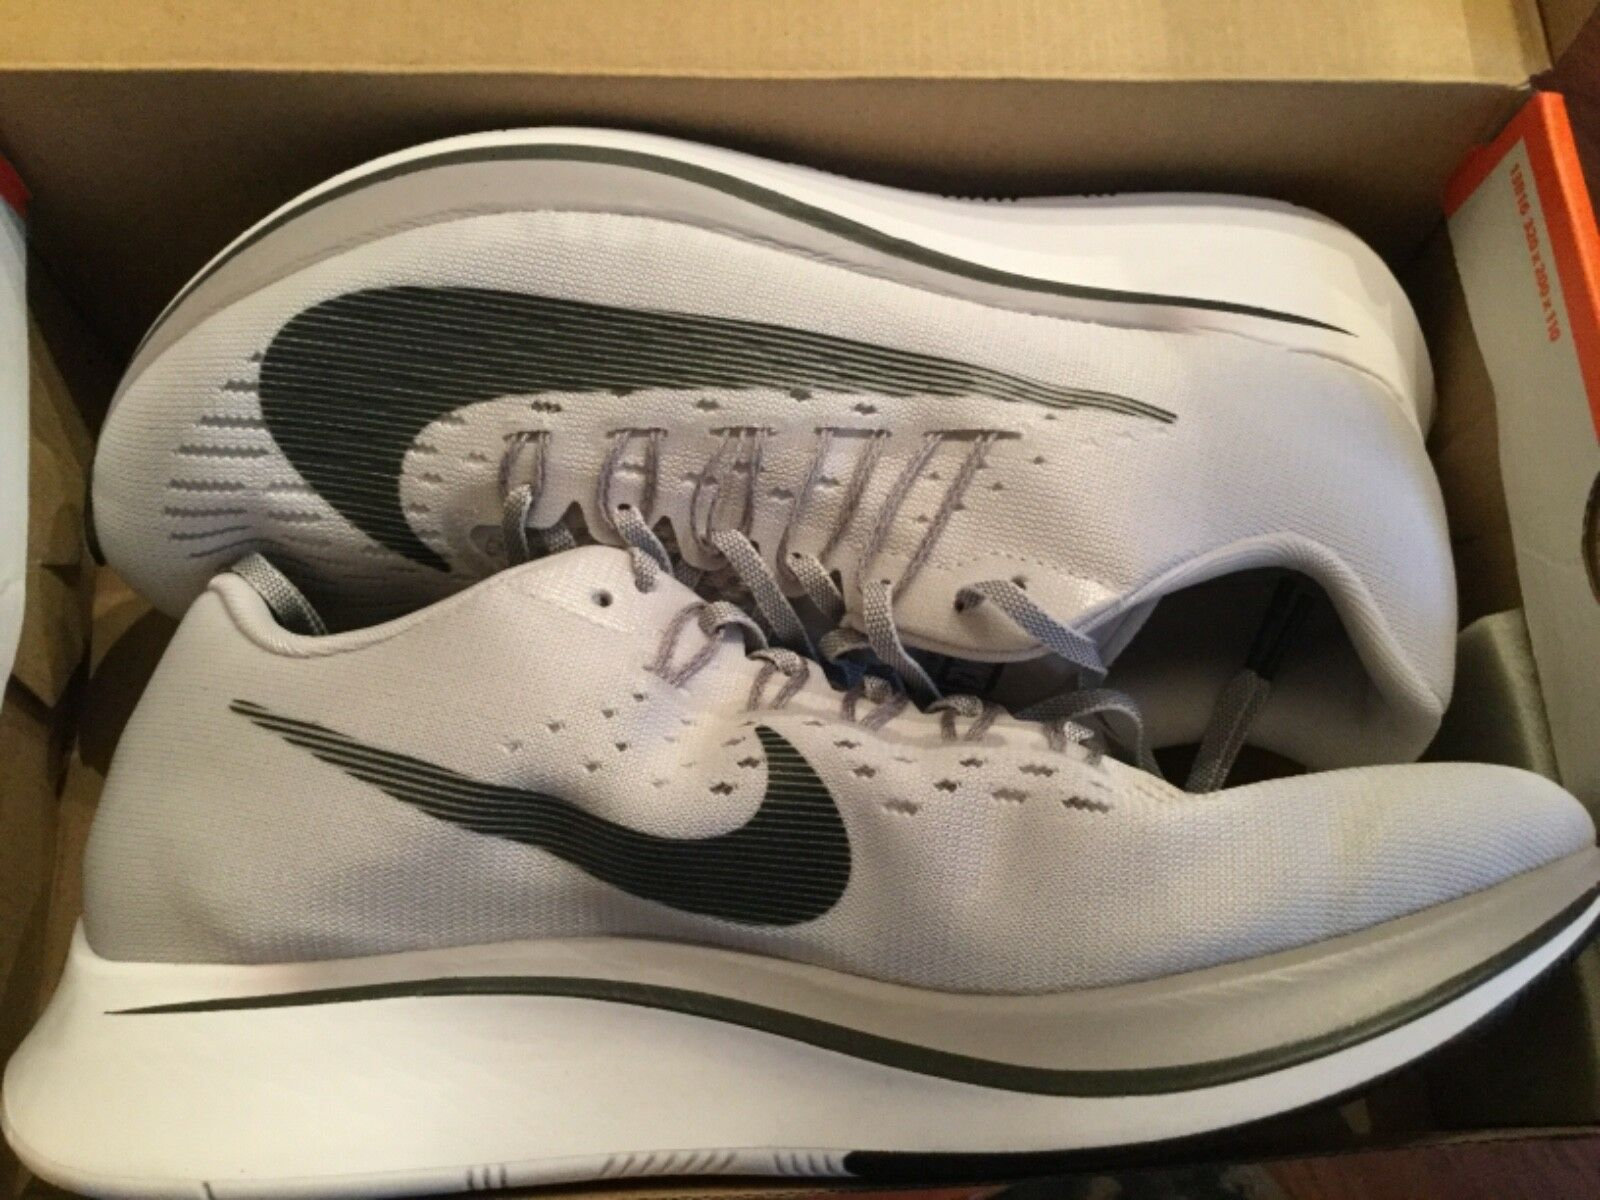 New Nike Mens Zoom Fly Run Running shoes 880848-002 sz 10 Vast Grey